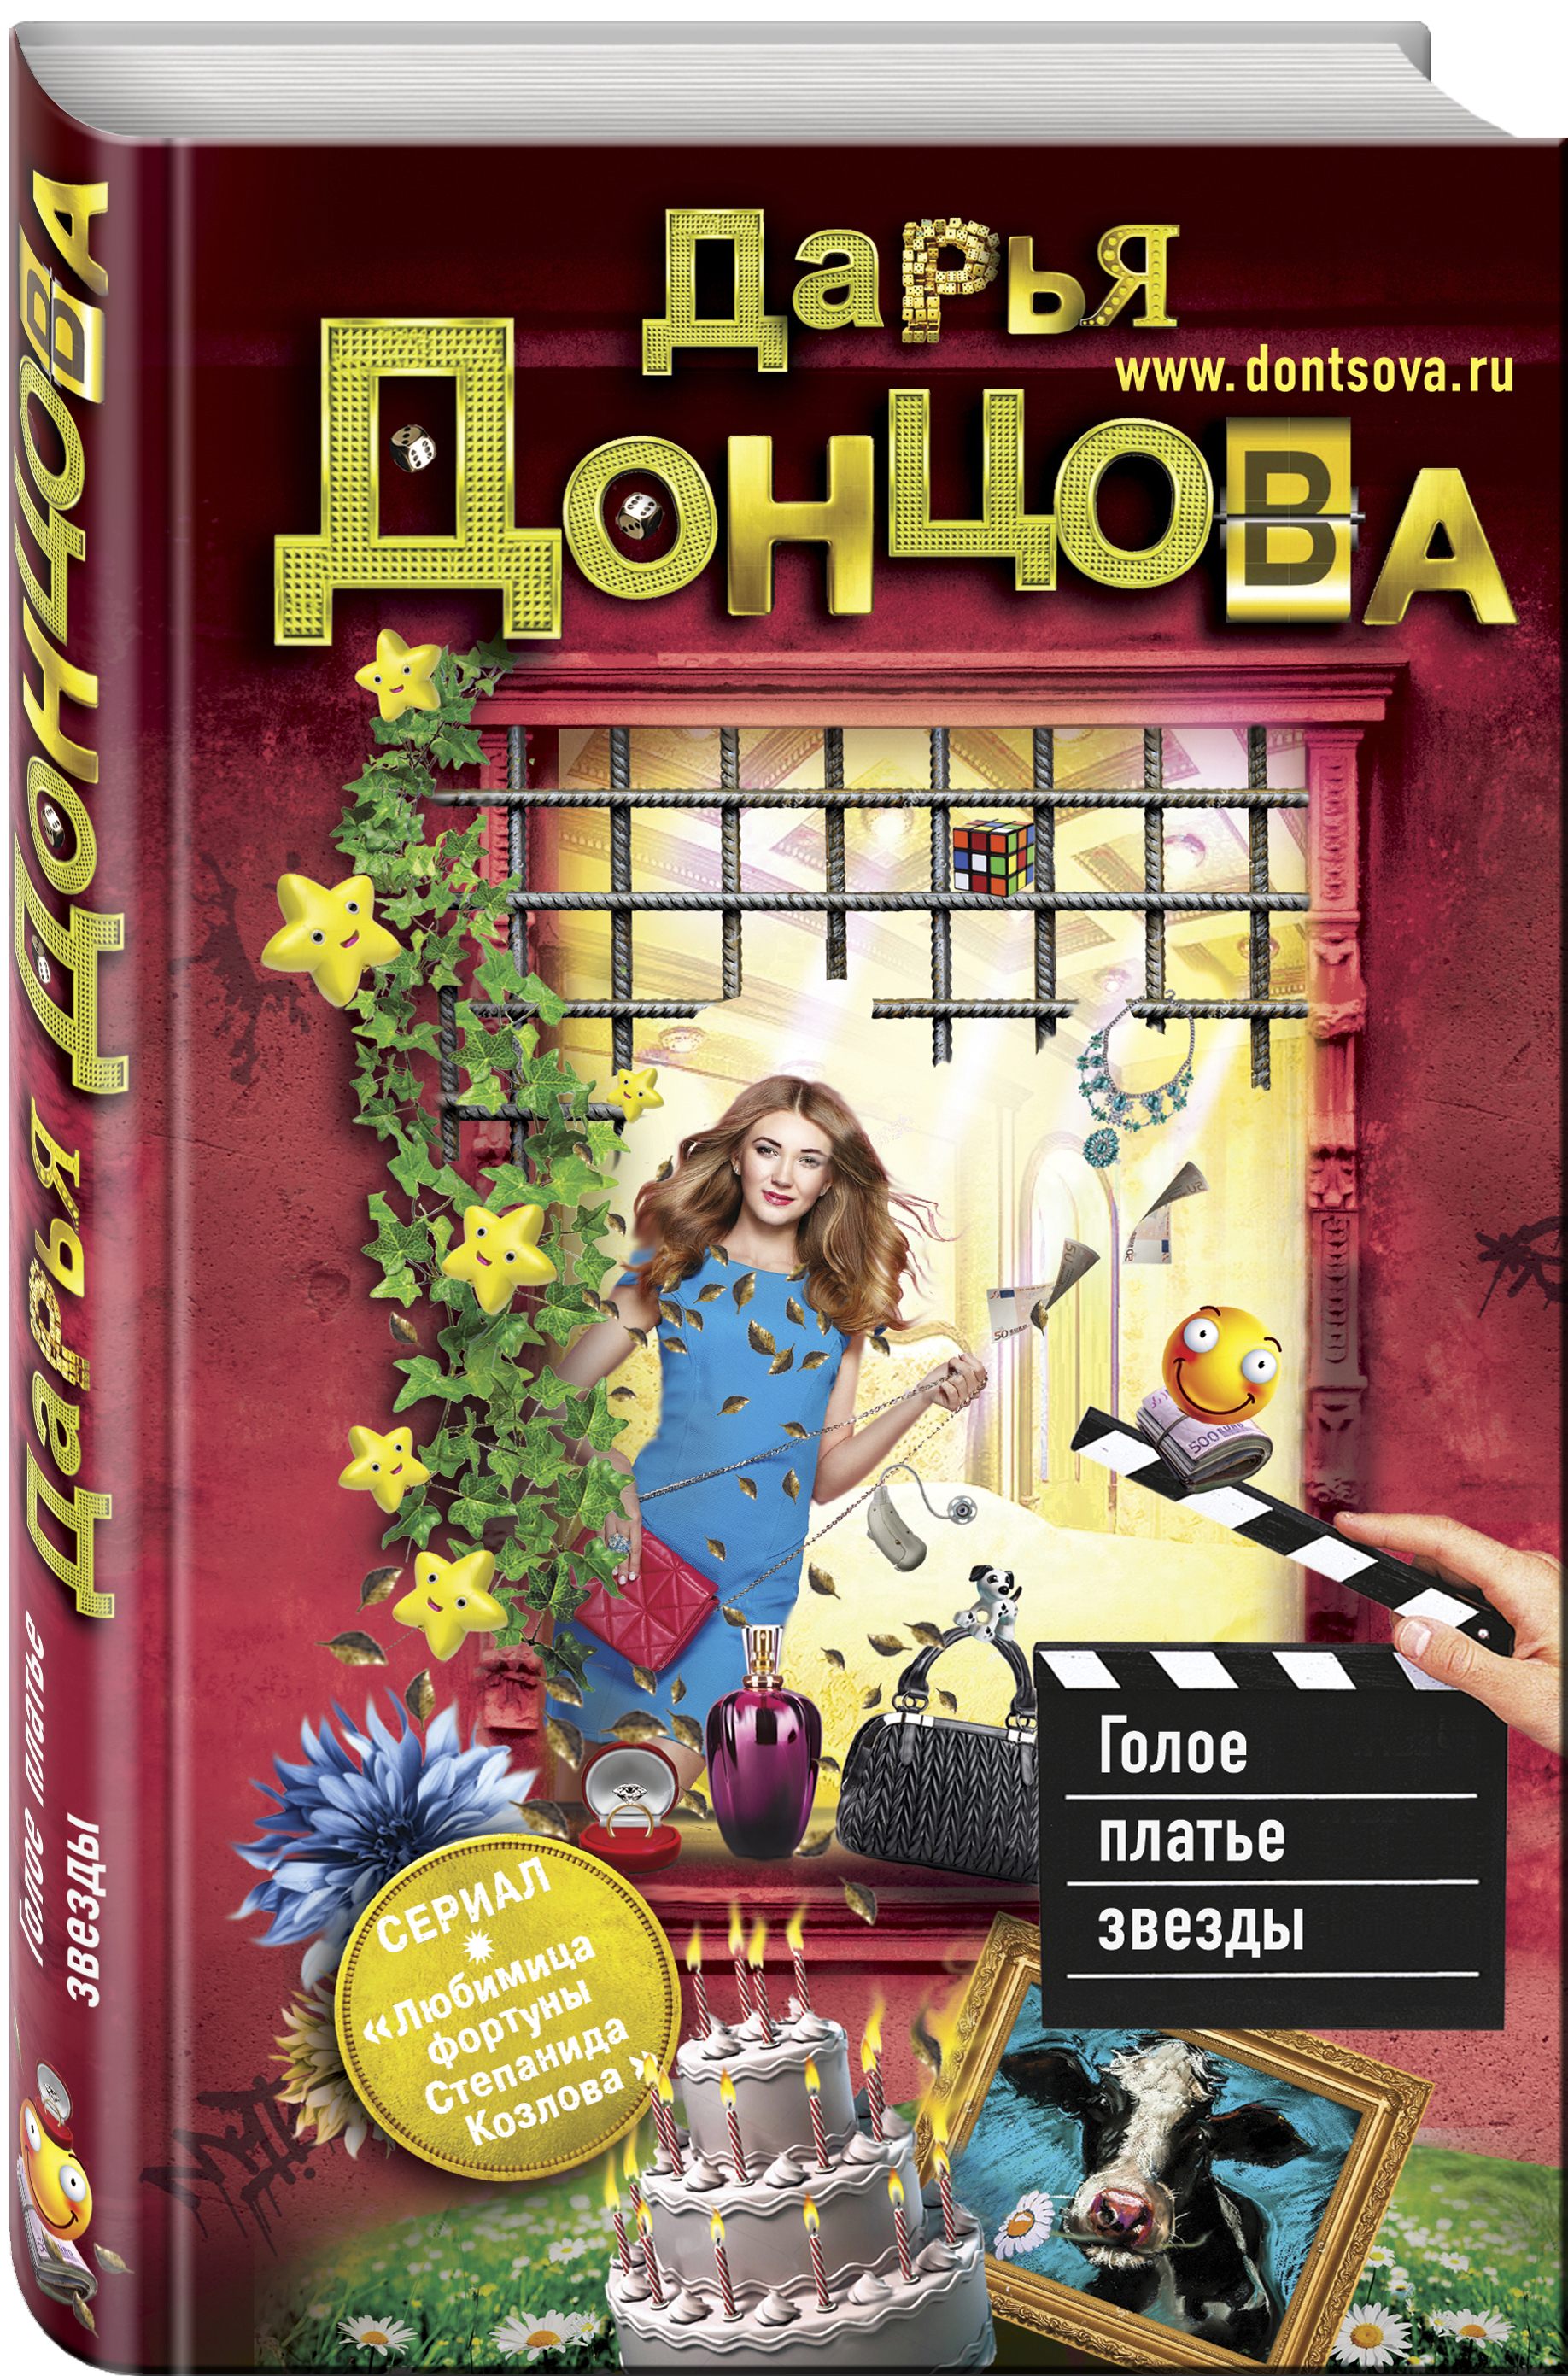 Дарья Донцова Голое платье звезды